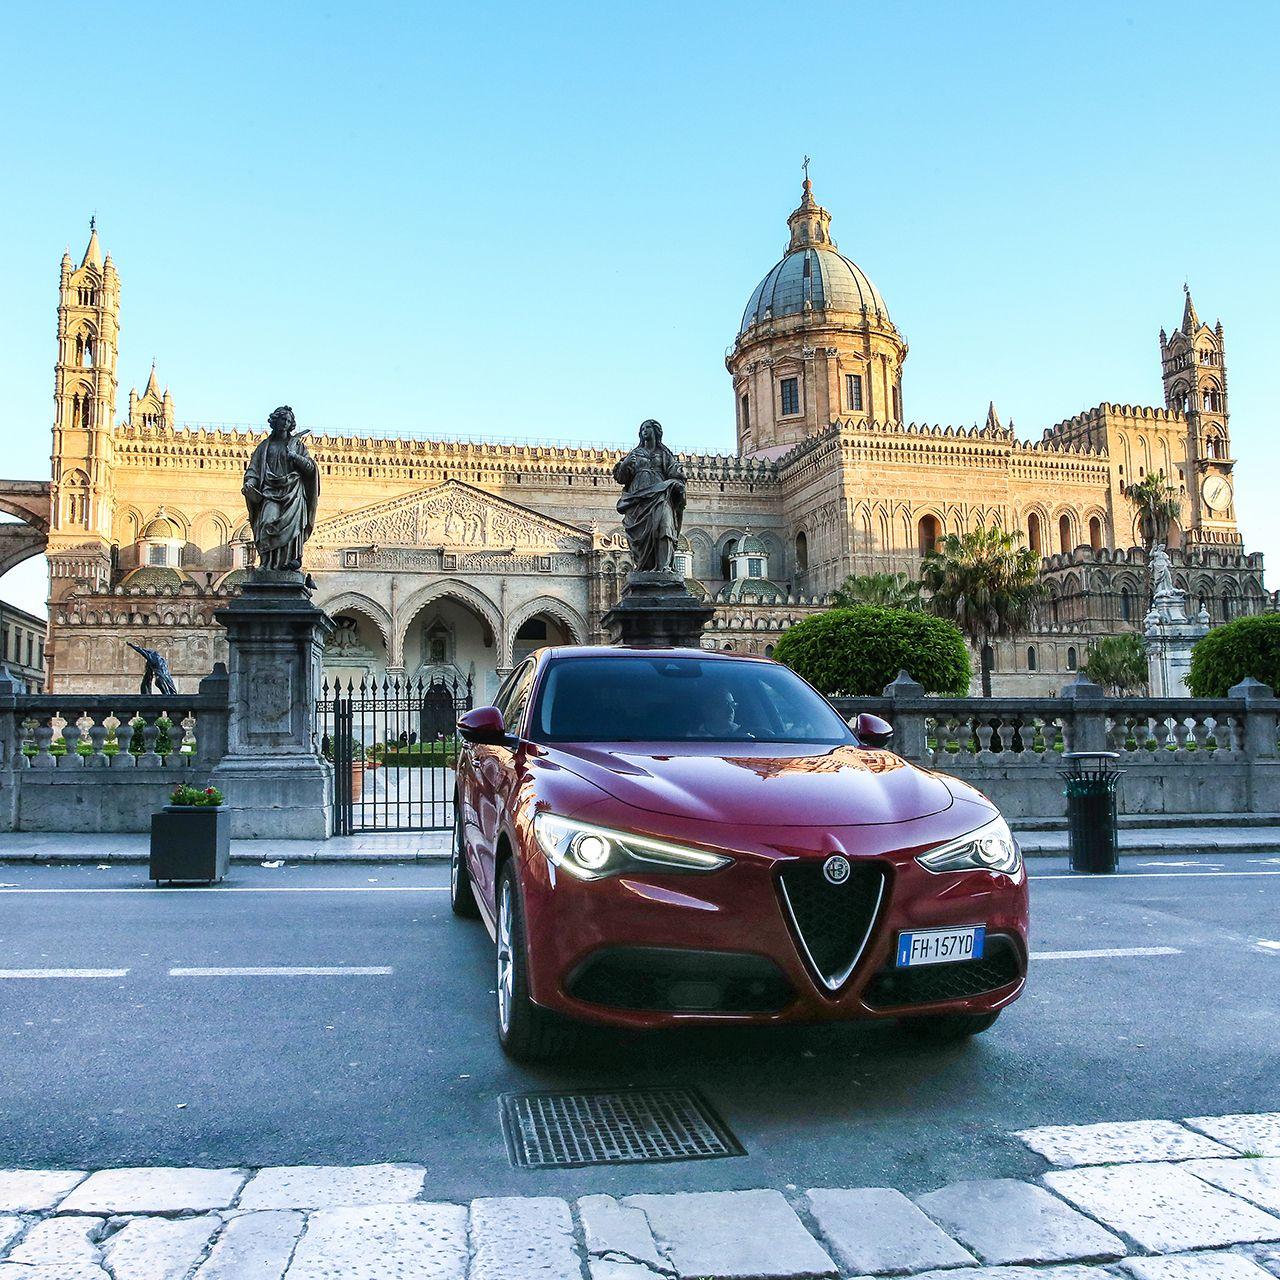 170420 Alfa Romeo Gastronomia 06 Ο πρώτος γύρος στο Targa Florio 2017: από την Taormina στην Cefalù Alfa, alfa romeo, Alfa Romeo Giulia, Alfa Romeo Giulia GTA, Alfa Romeo Giulietta, Alfa Romeo Giulietta SZ, Classic, Targa Florio, videos, αγωνες